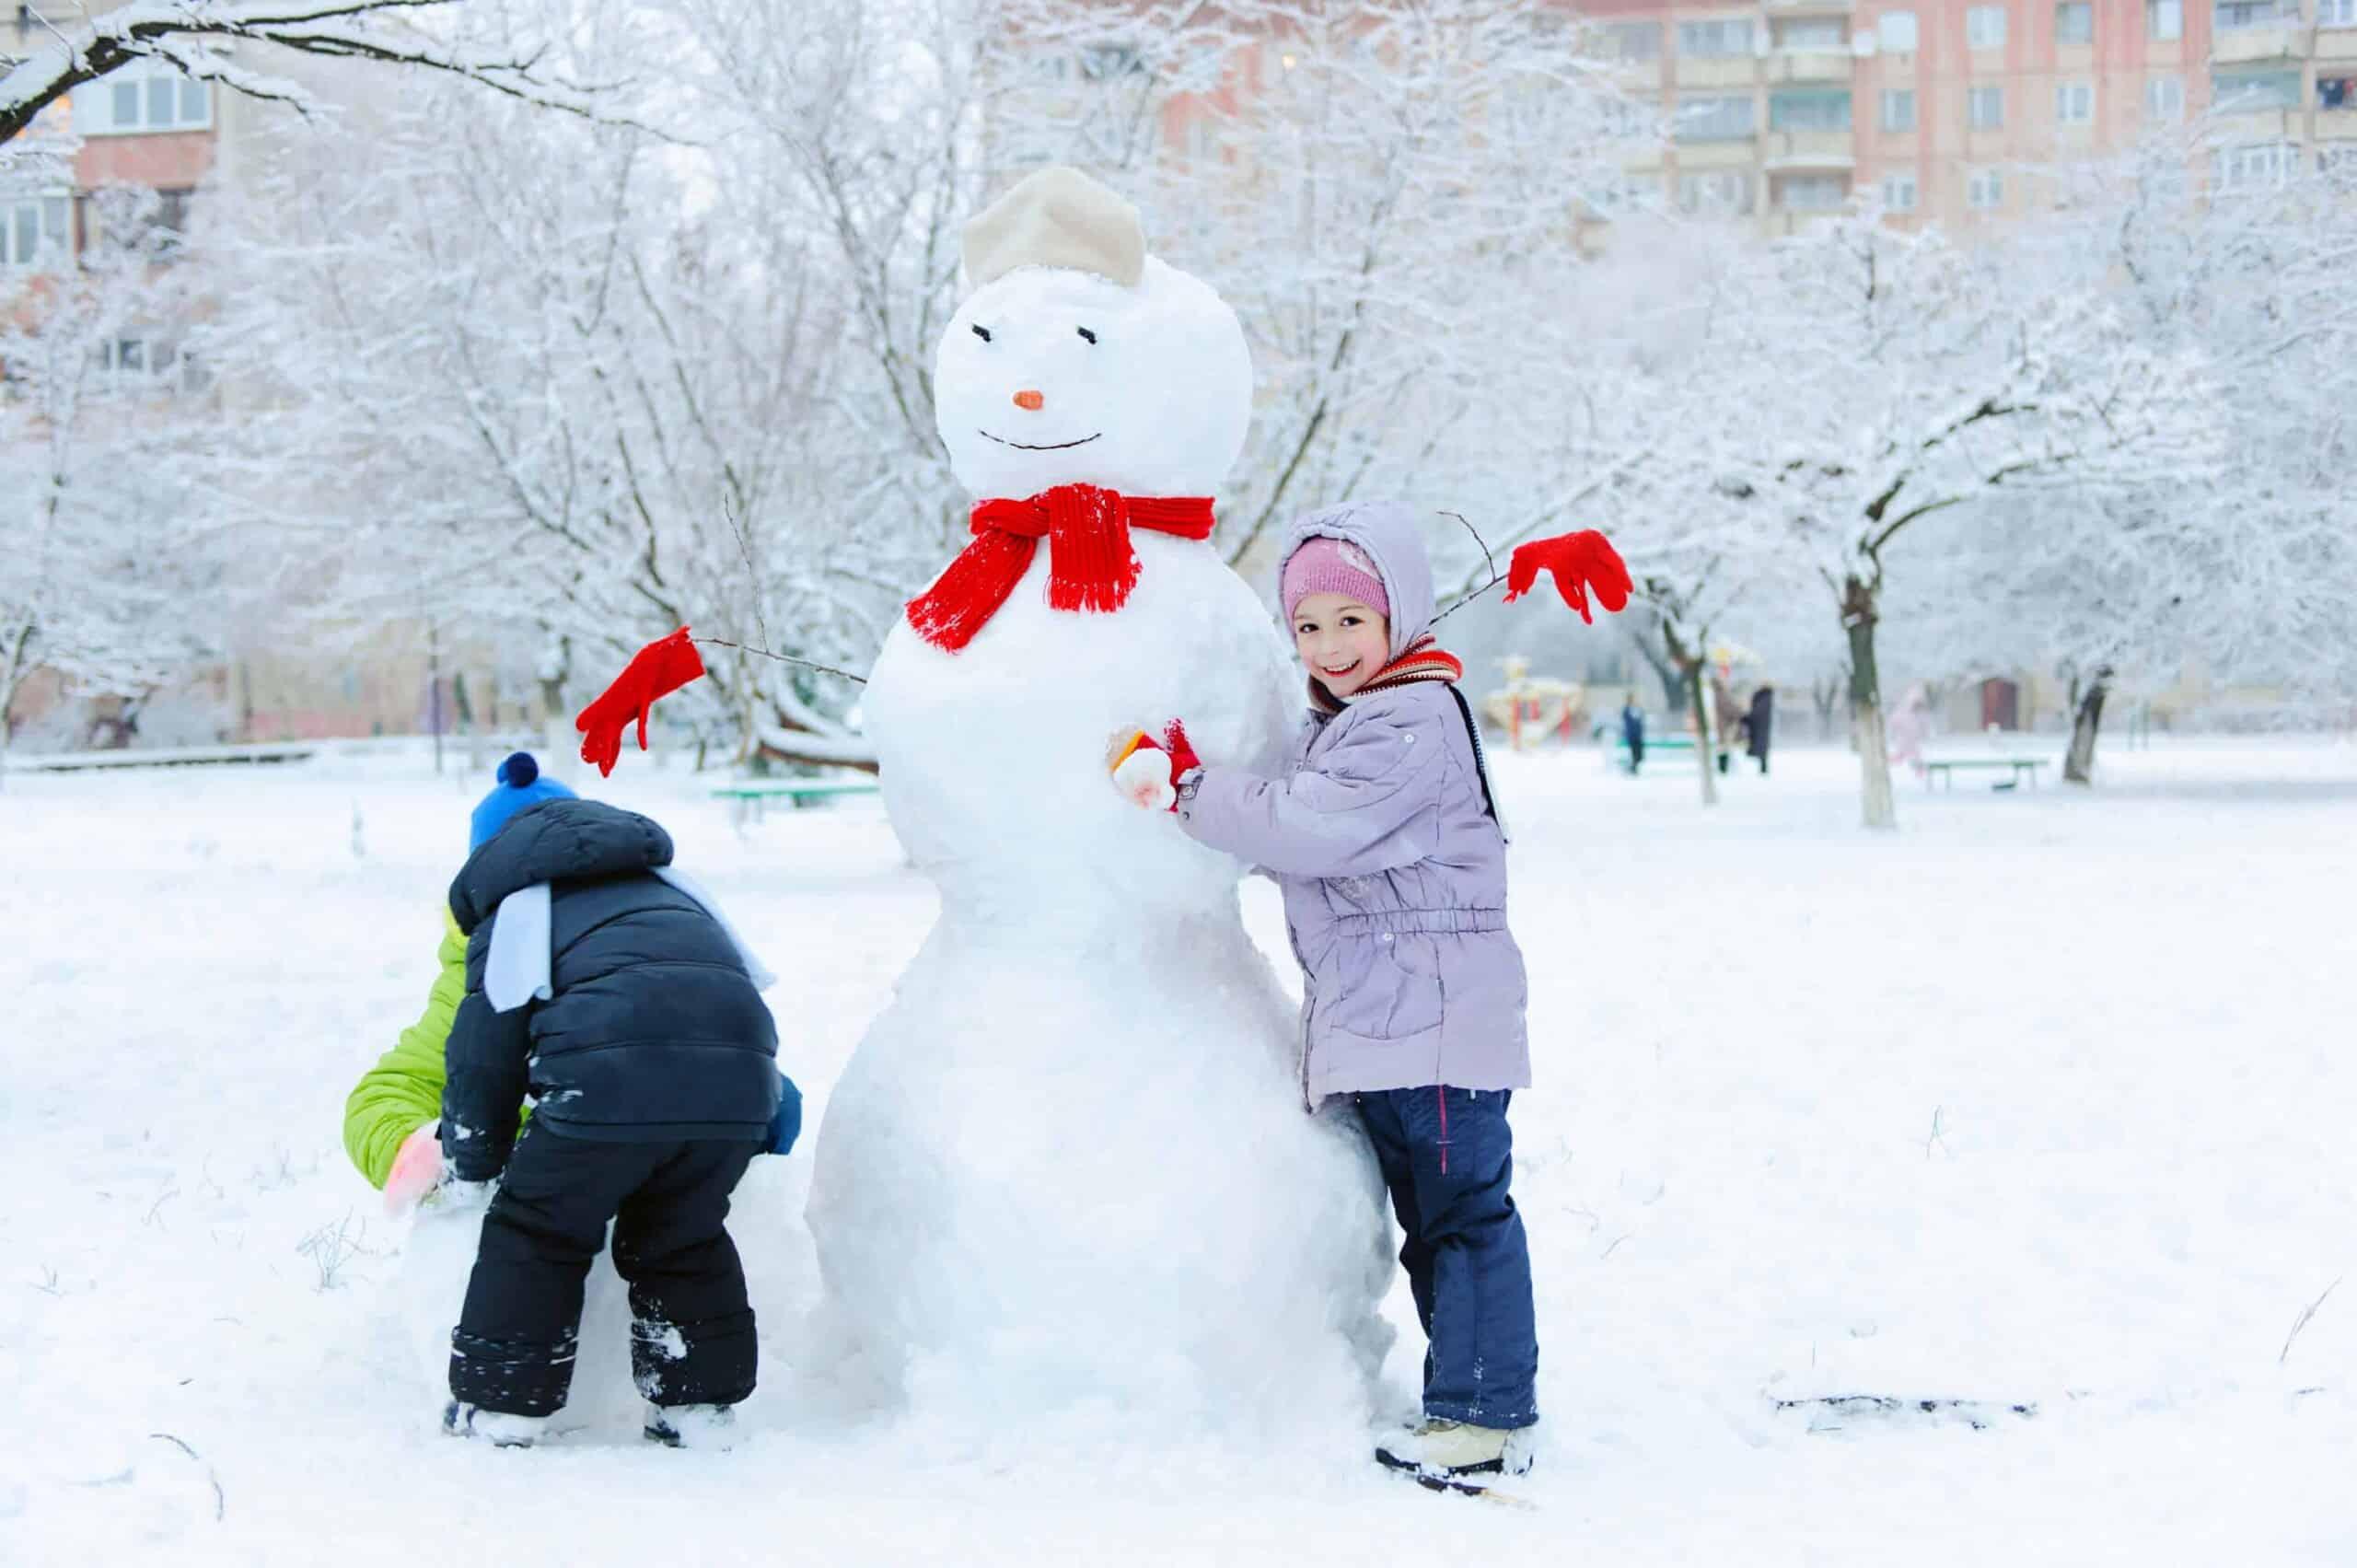 Snow day activities